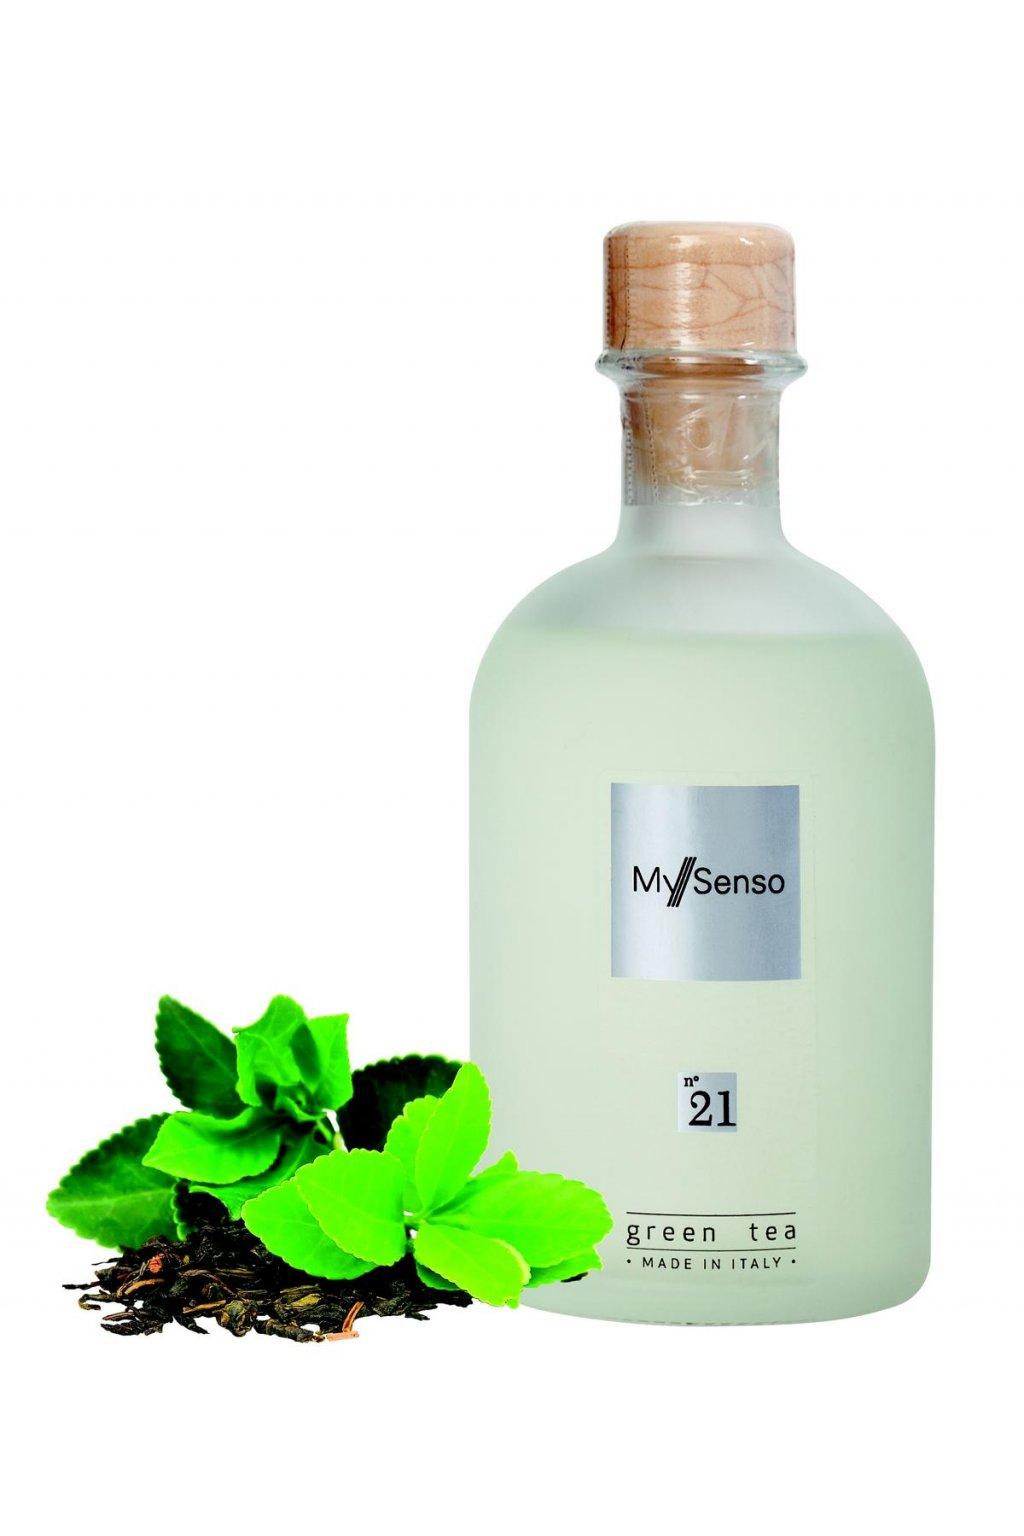 177 my senso nahradni napln pro aromaticky difuzer n 21 green tea zeleny caj 240ml